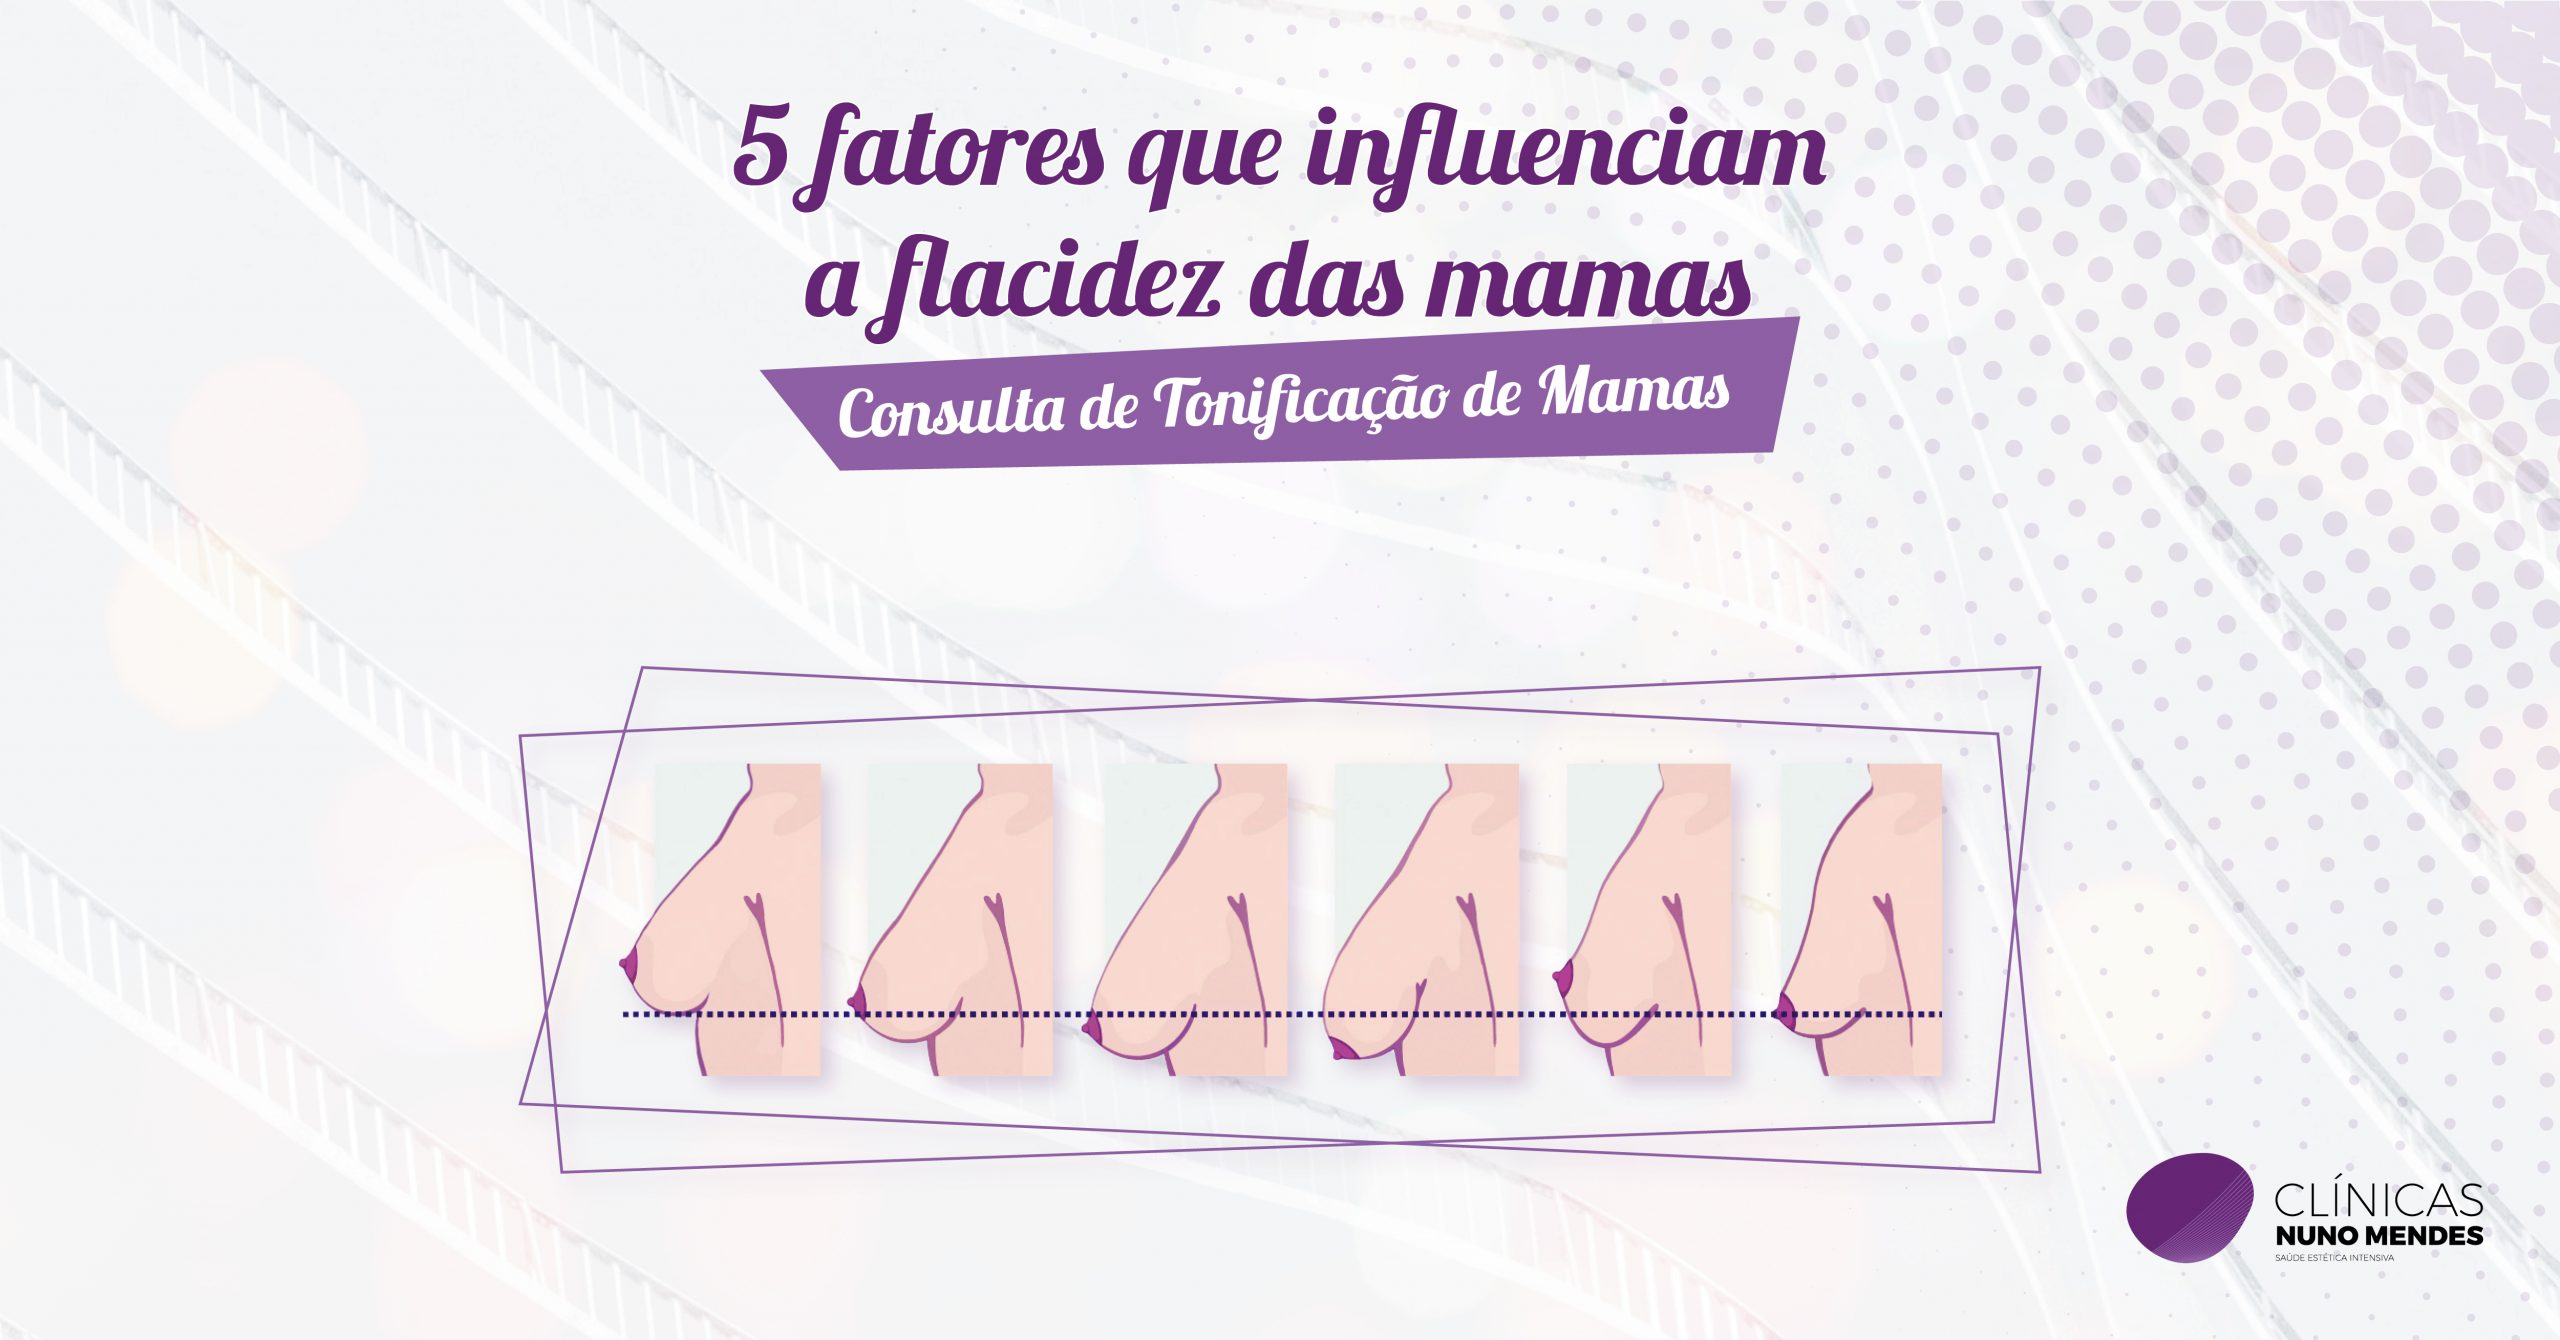 A flacidez das mamas